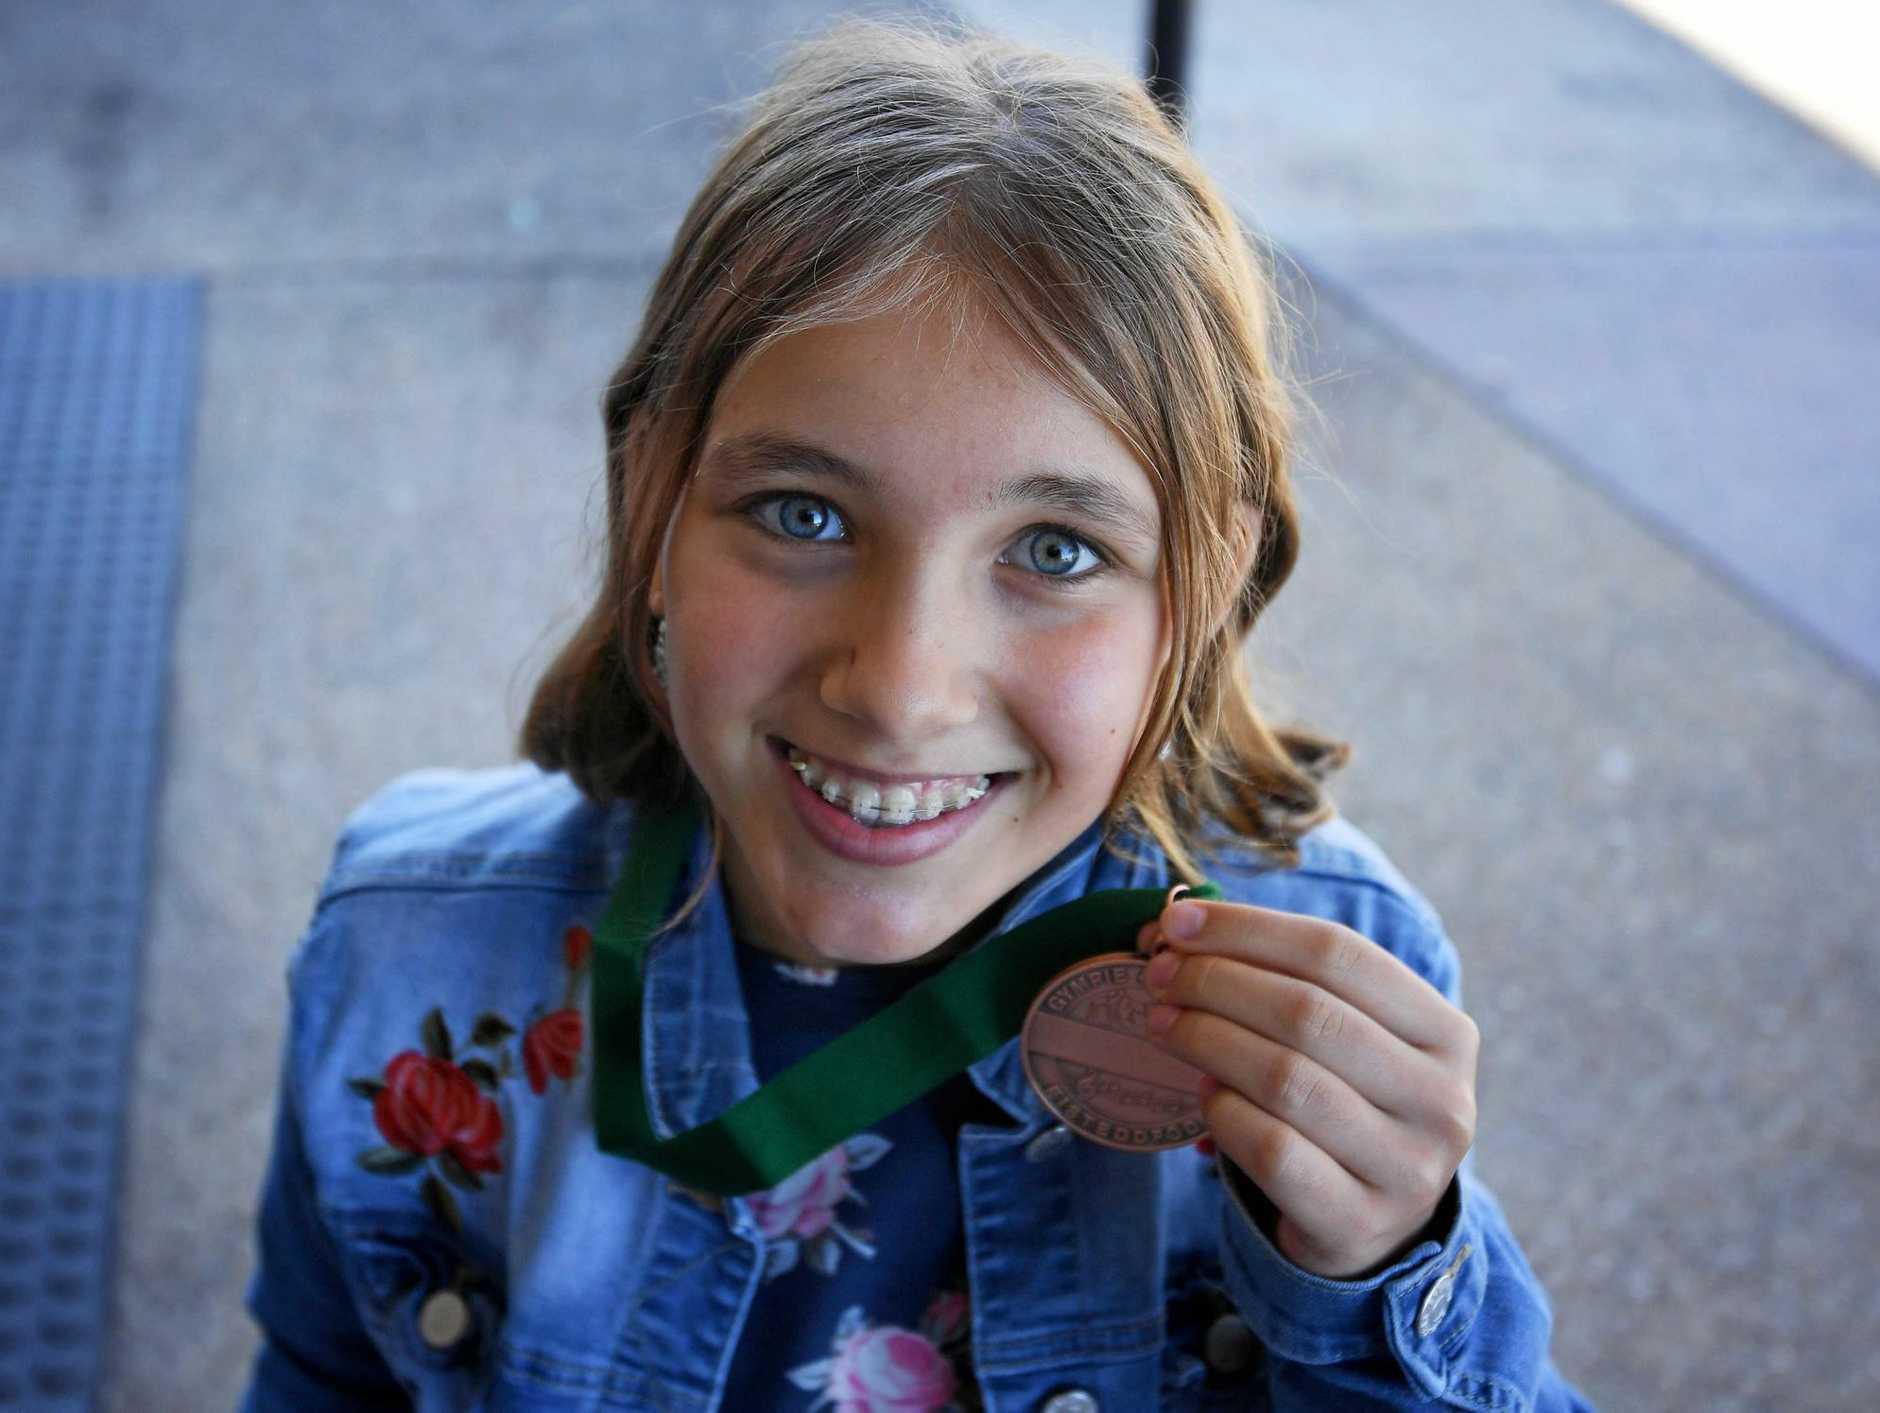 Madeleine Suttie with her medal.